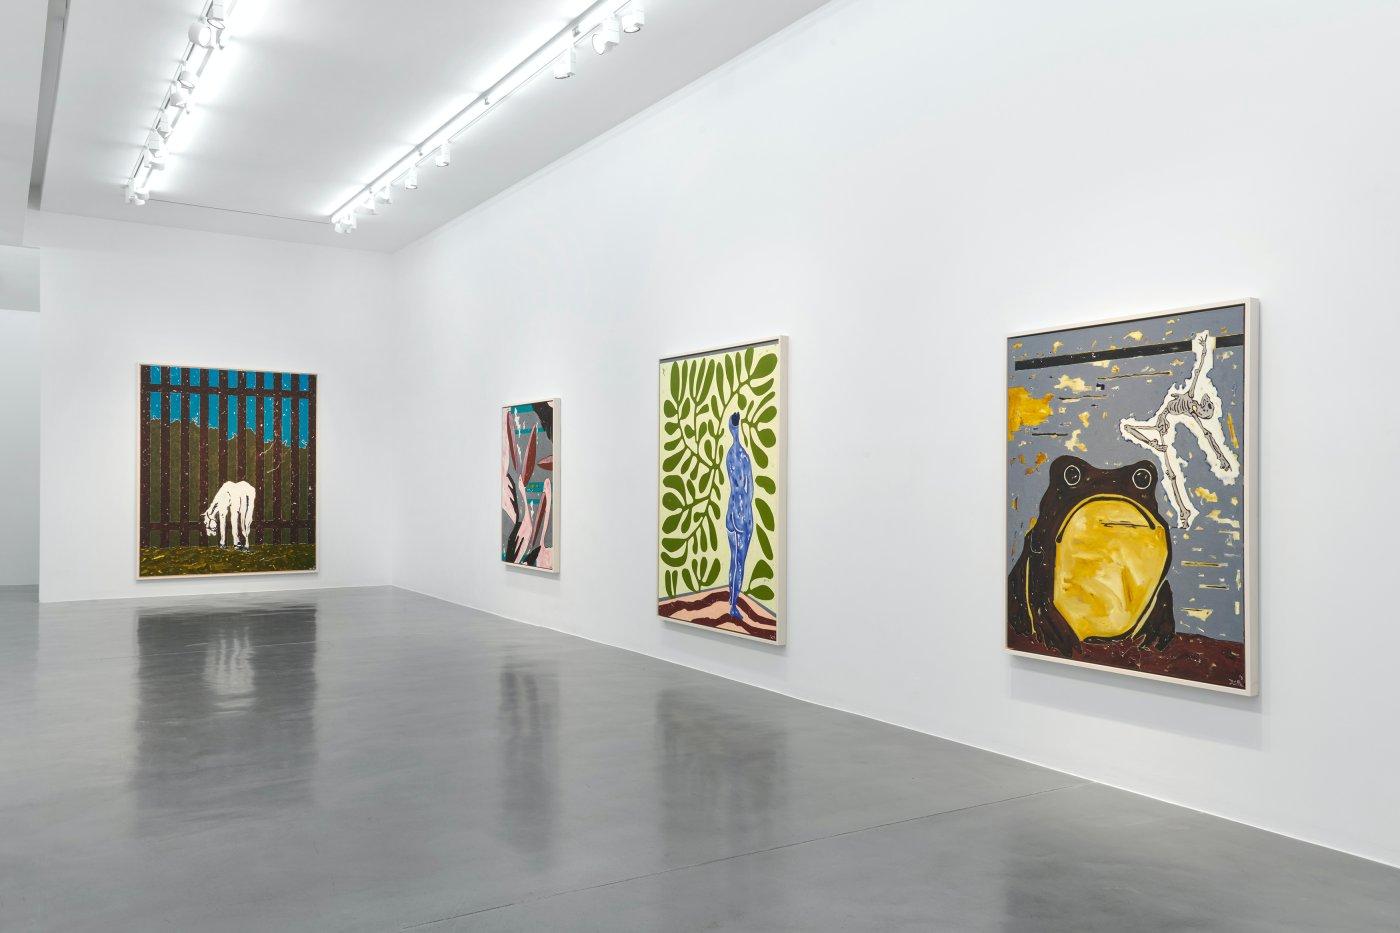 Simon Lee Gallery Werner Buttner 2